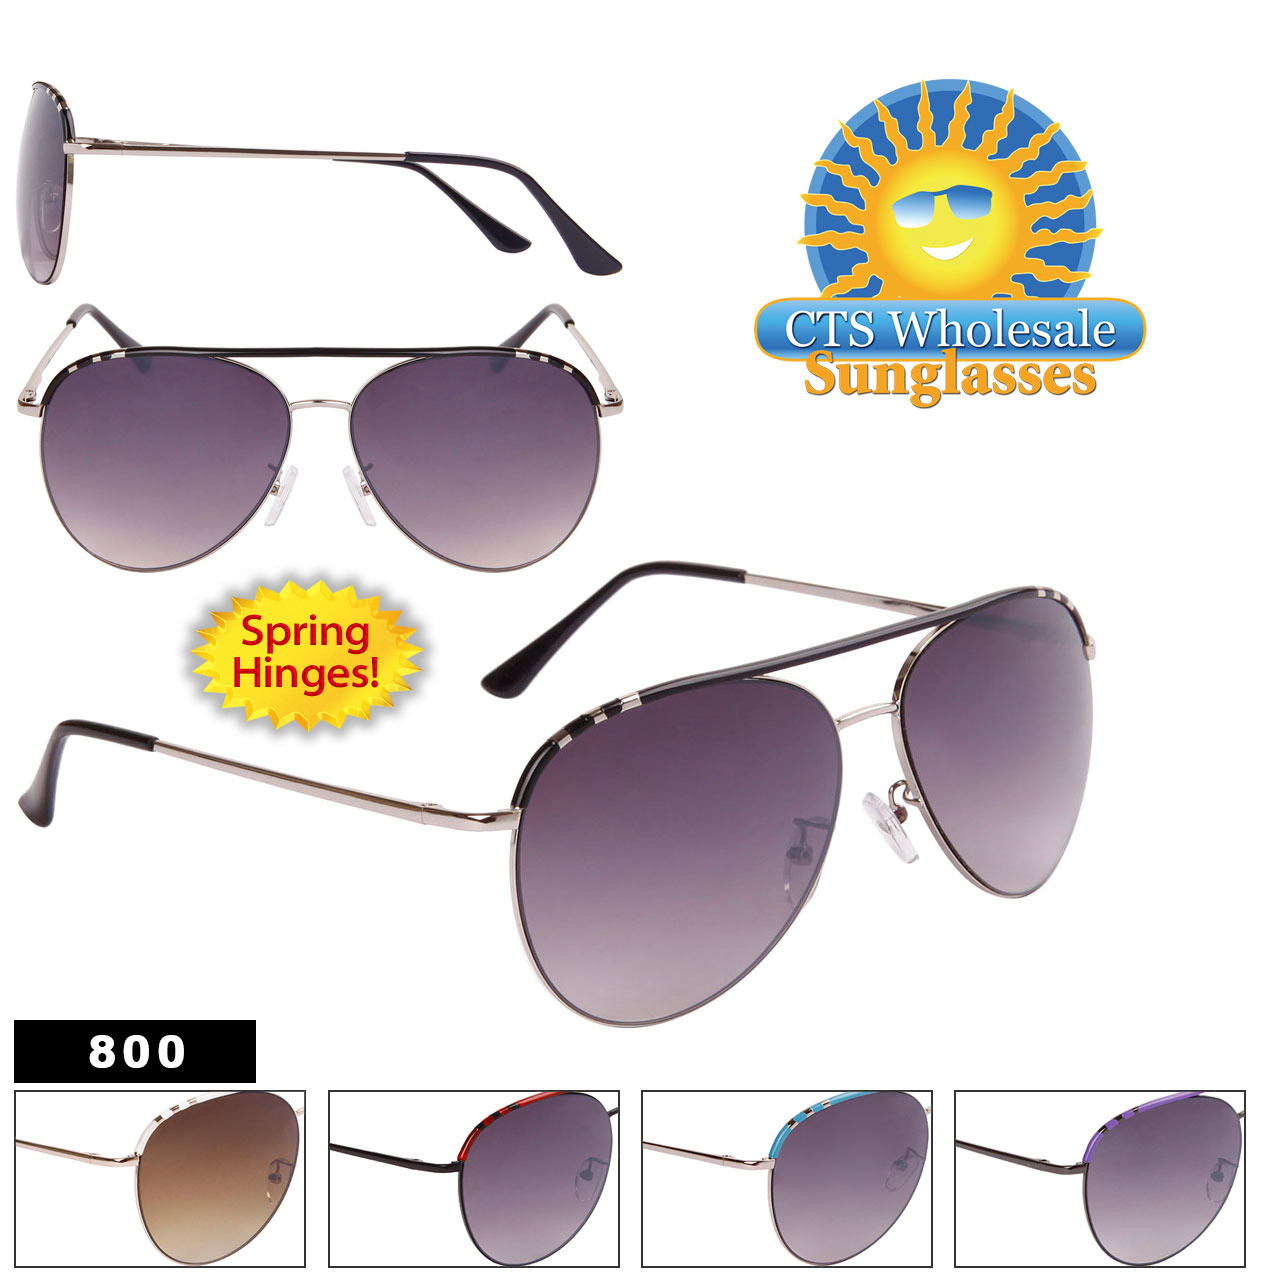 Bulk Spring Hinge Aviator Sunglasses - Style #800